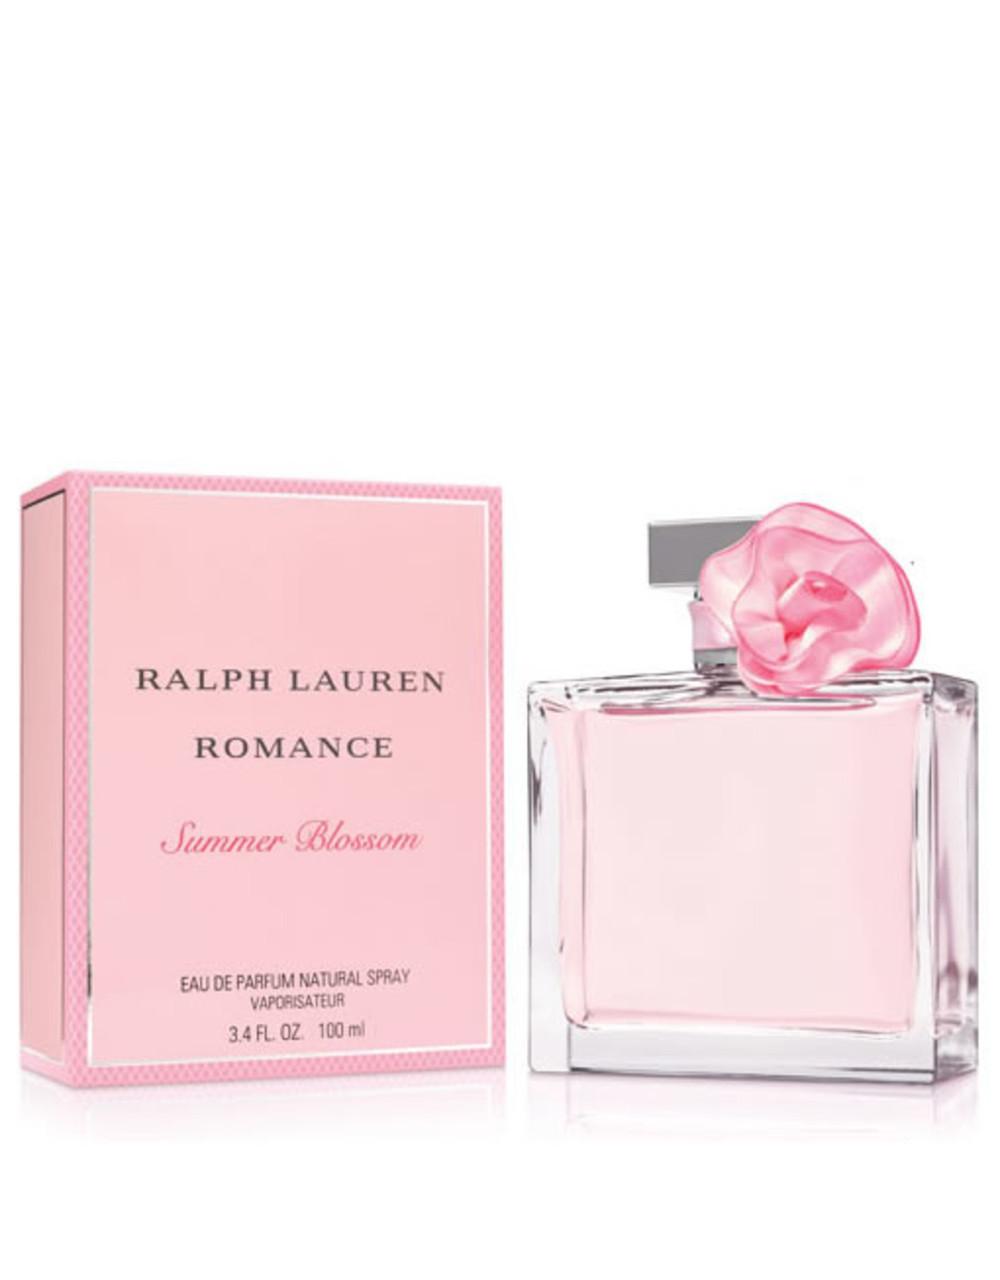 Парфуми Оригінал жіночі Ralph Lauren Romance Summer Blossom